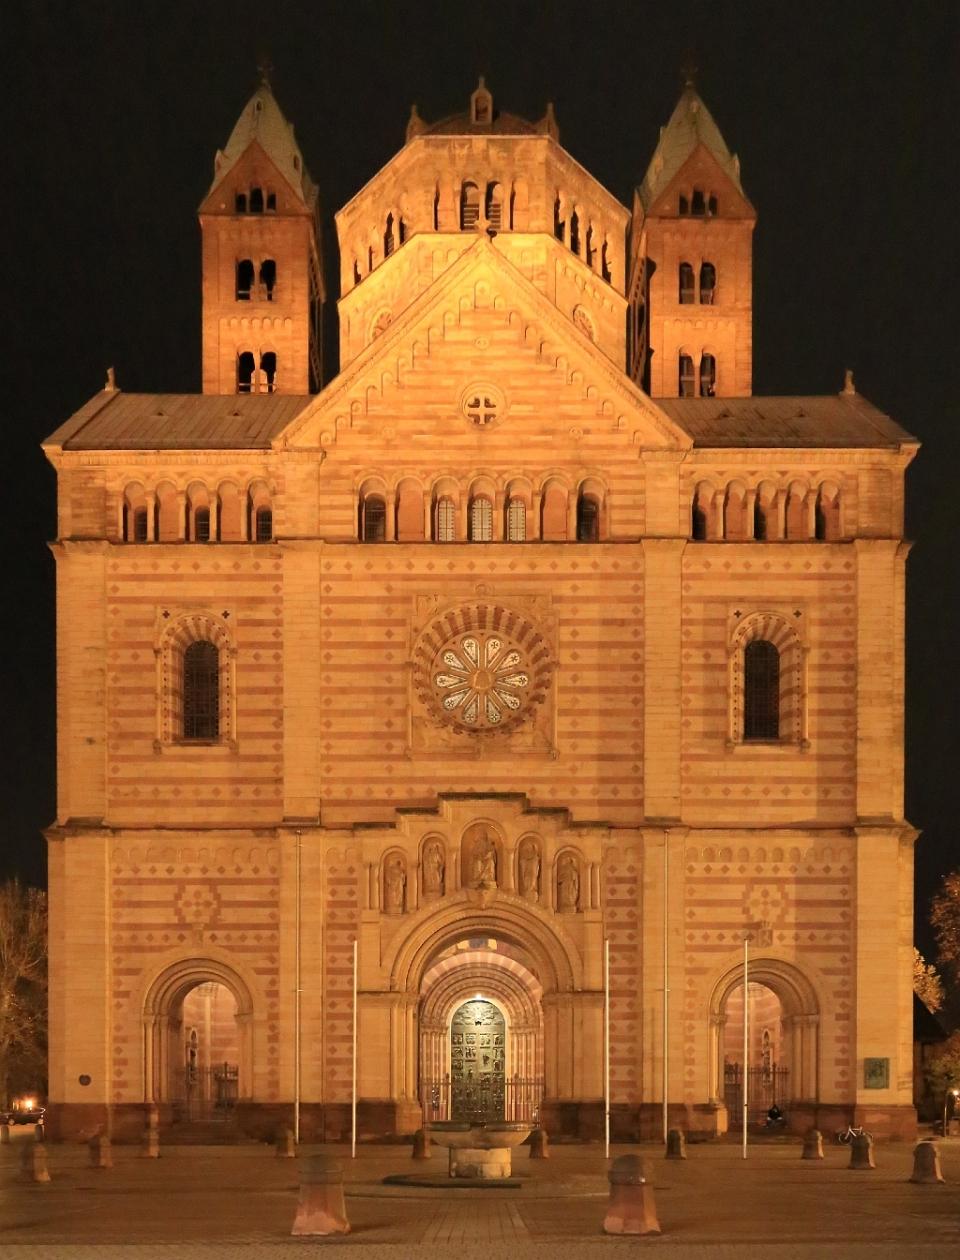 West portal, Kaiserdom, Speyer Cathedral, Domplatz, Speyer, Germany, UNESCO World Heritage Site, fotoeins.com